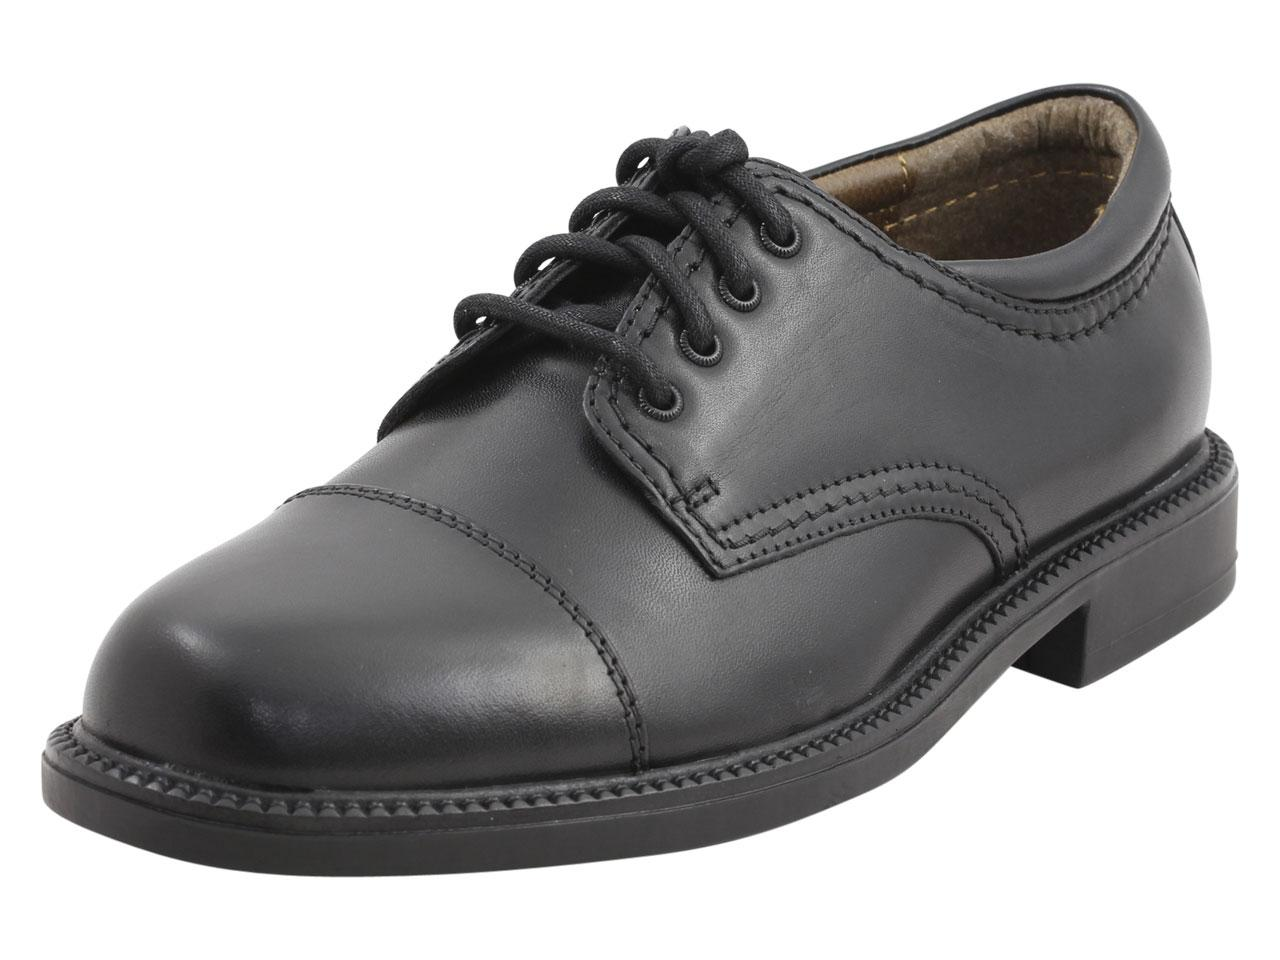 Image of Dockers Men's Gordon Cap Toe Oxfords Shoes - Black - 11 E(W) US